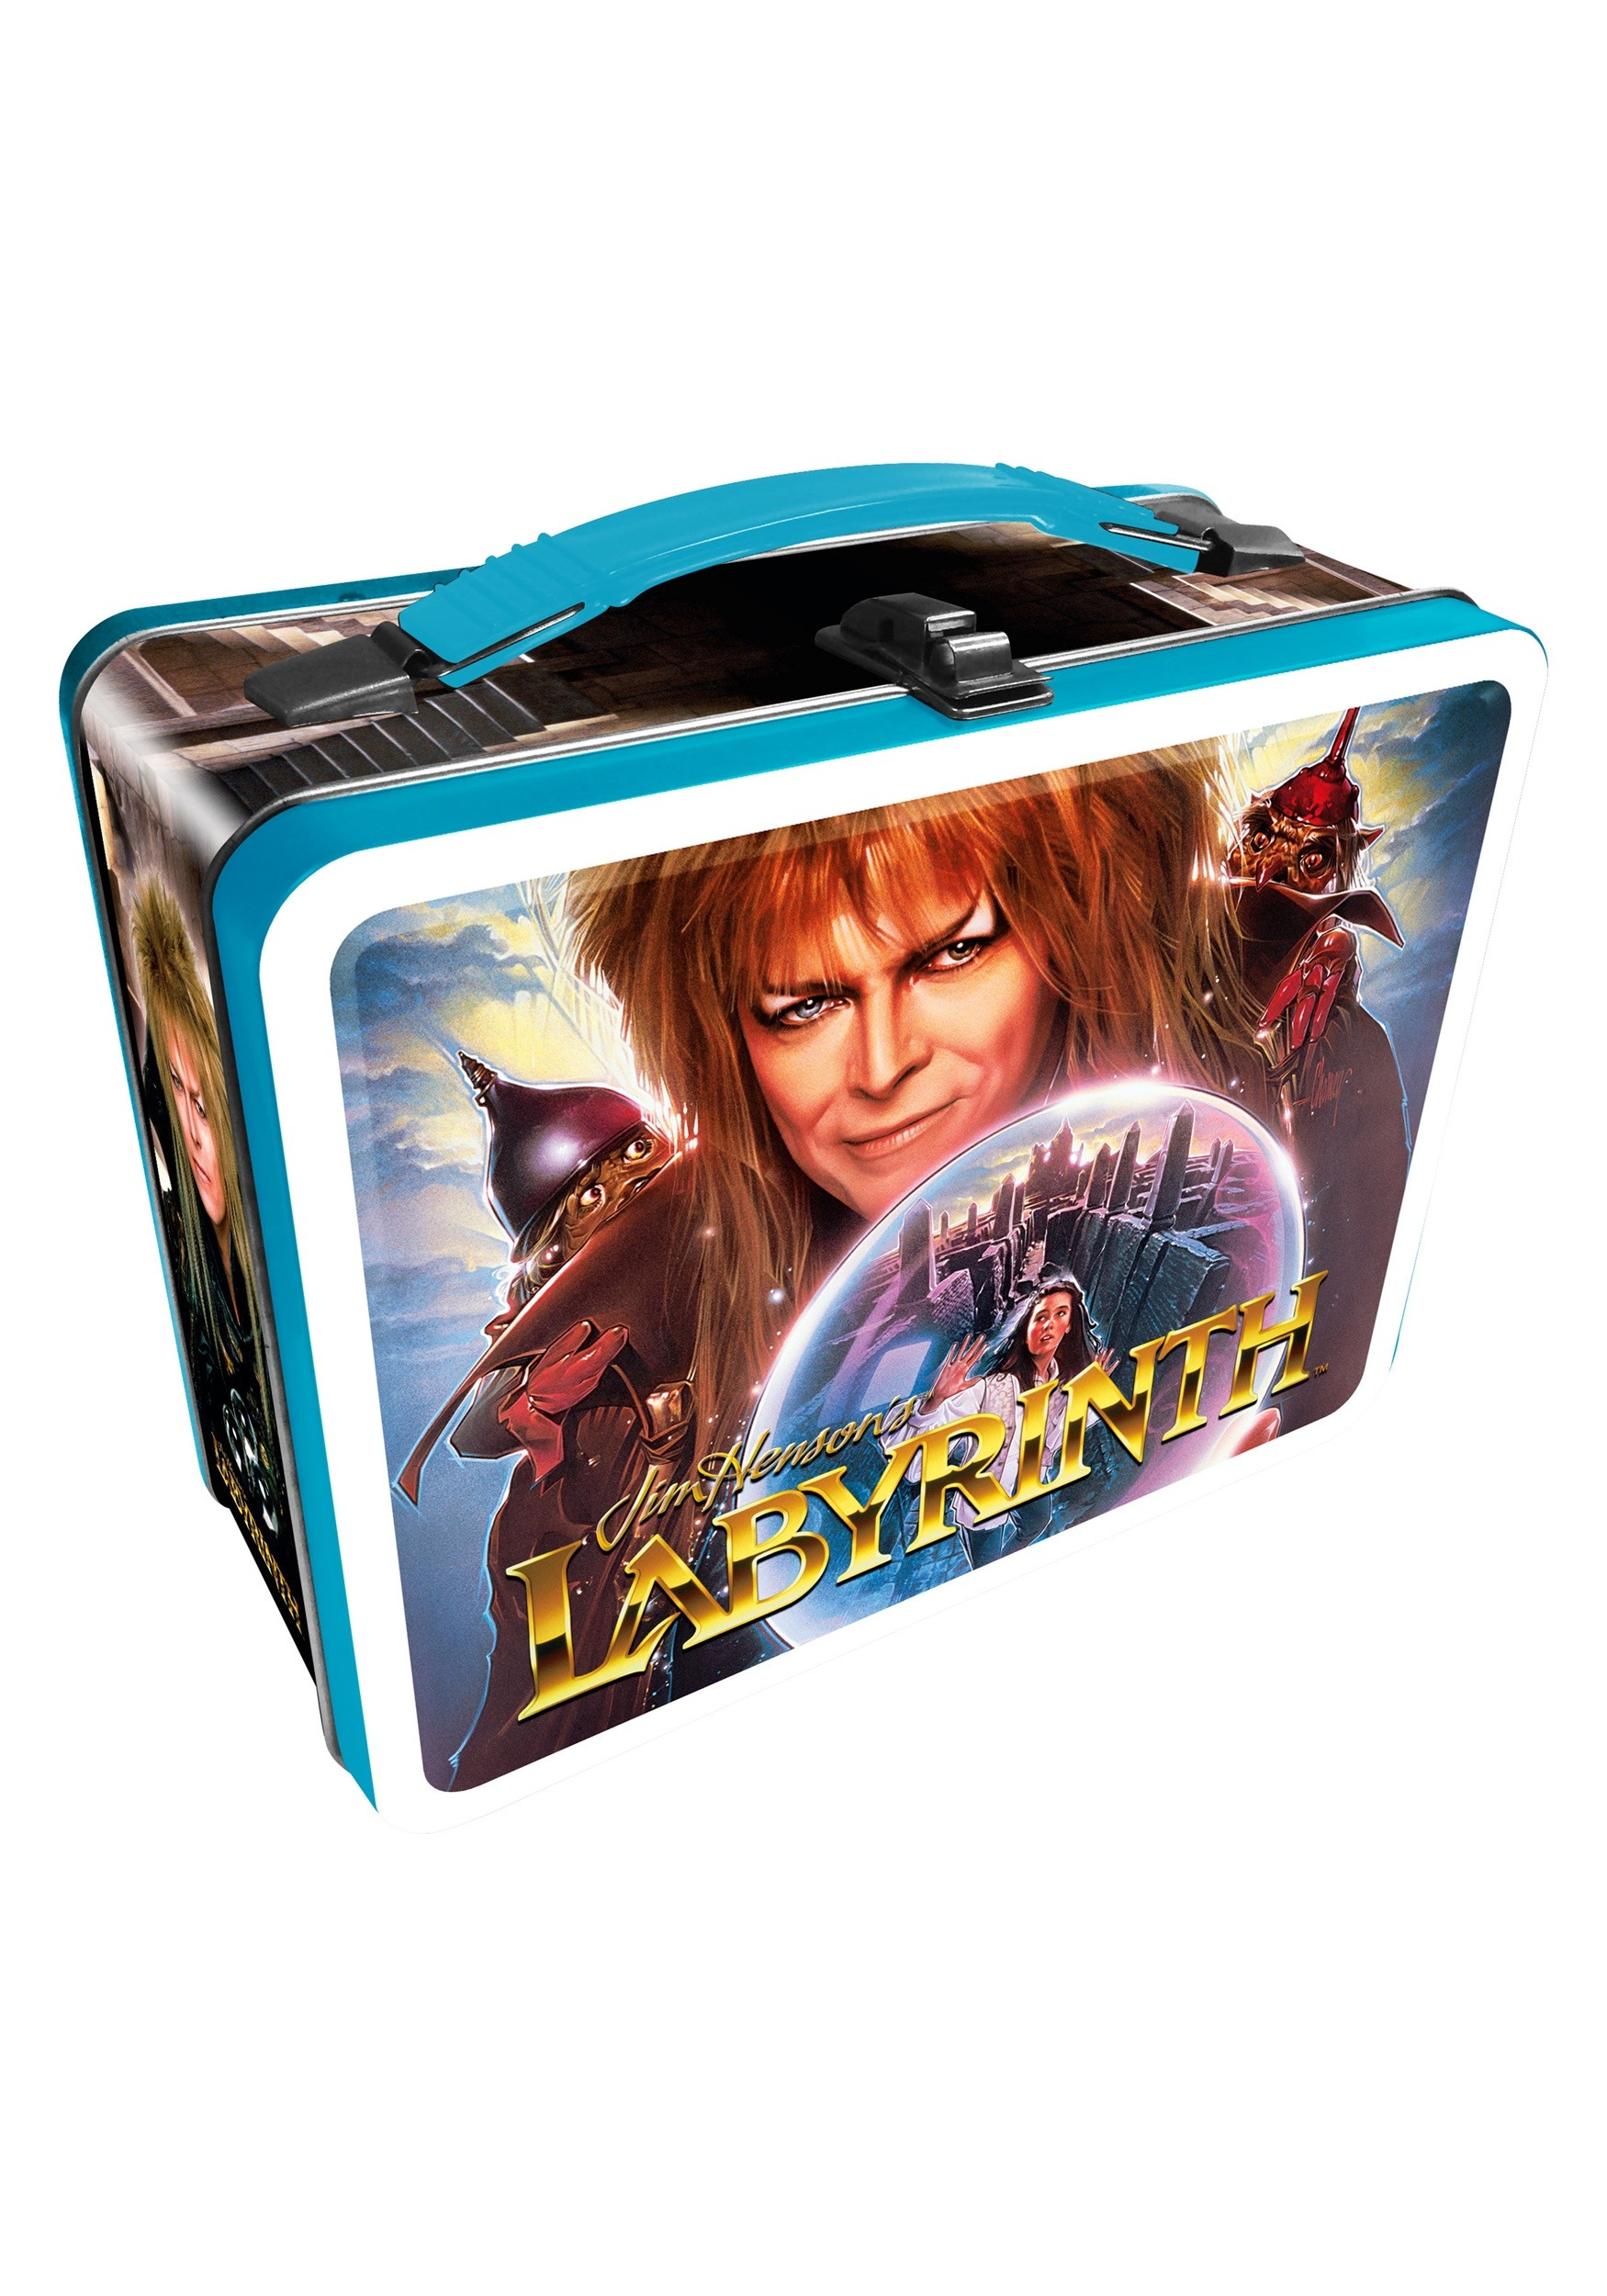 80s labyrinth metal lunch box